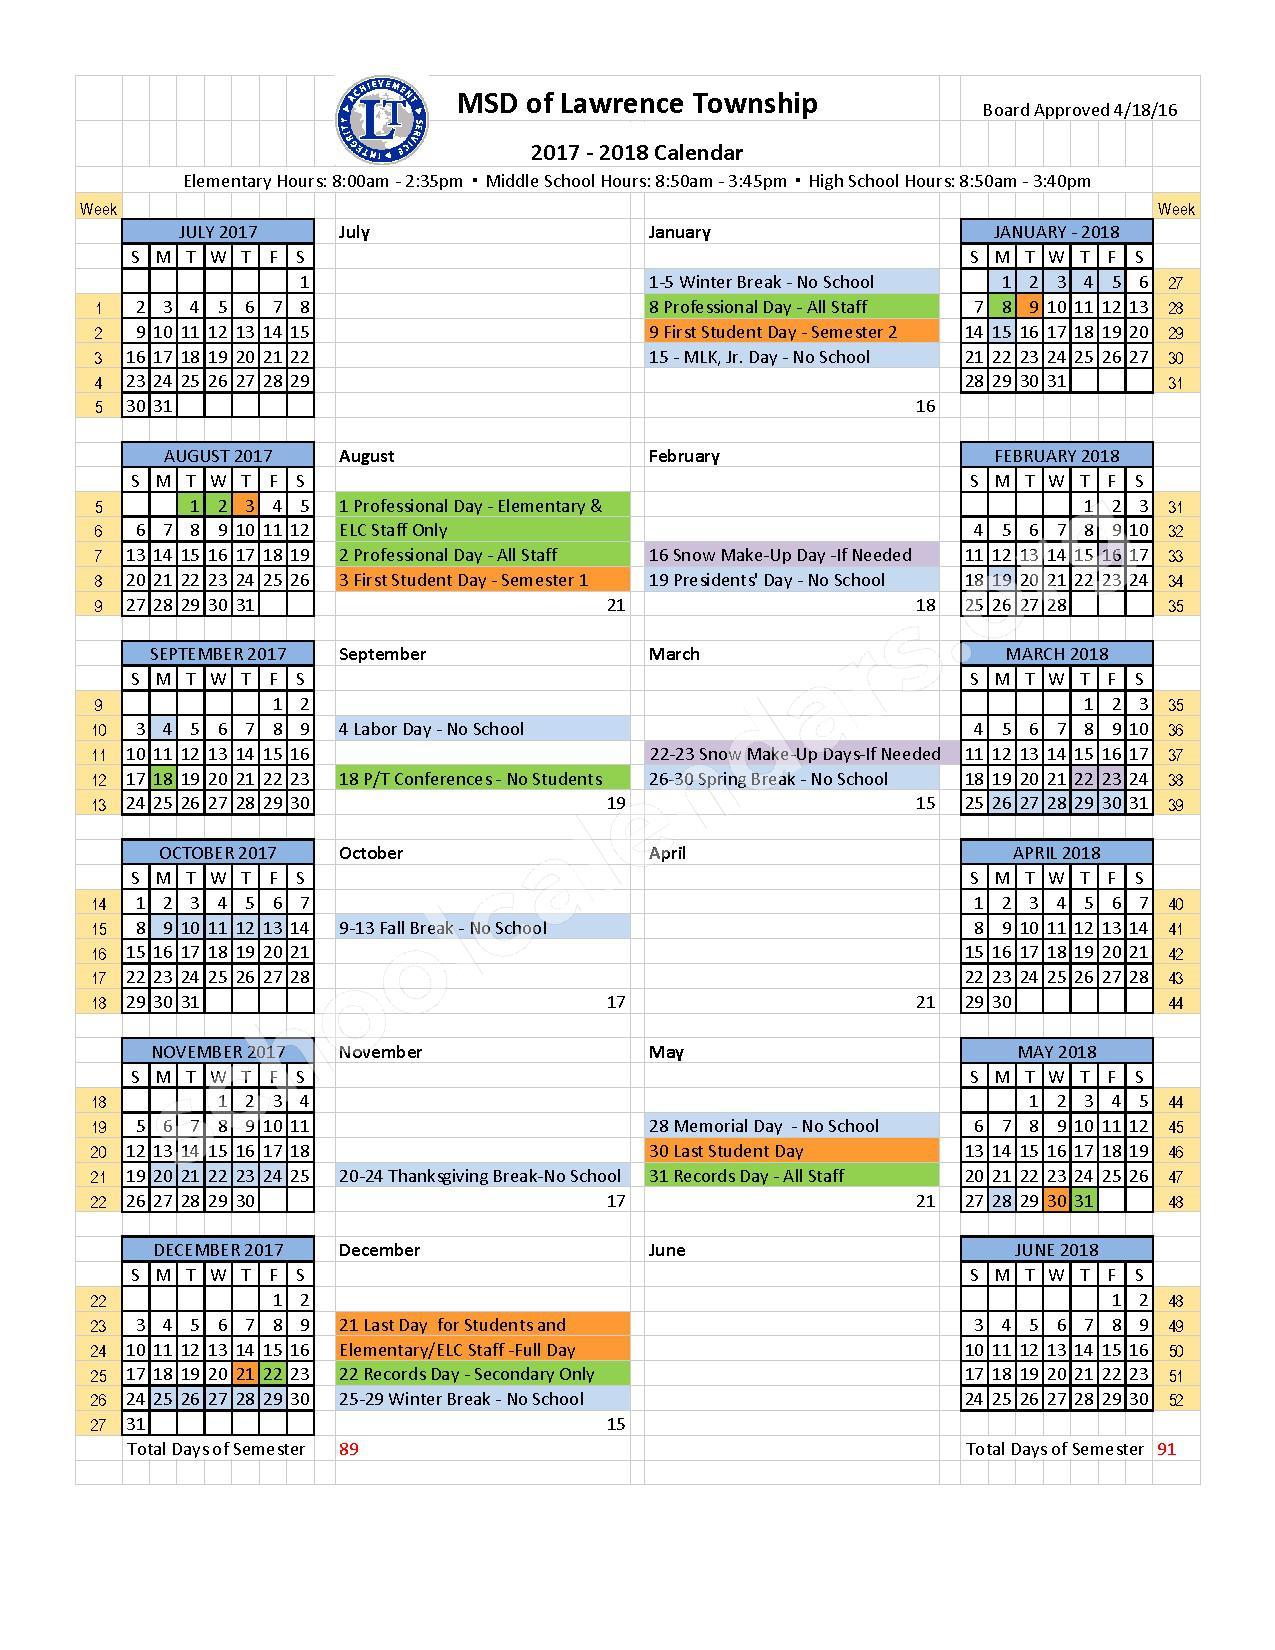 2017 - 2018 School Year Calendar – Metropolitan School District of Lawrence Township – page 1